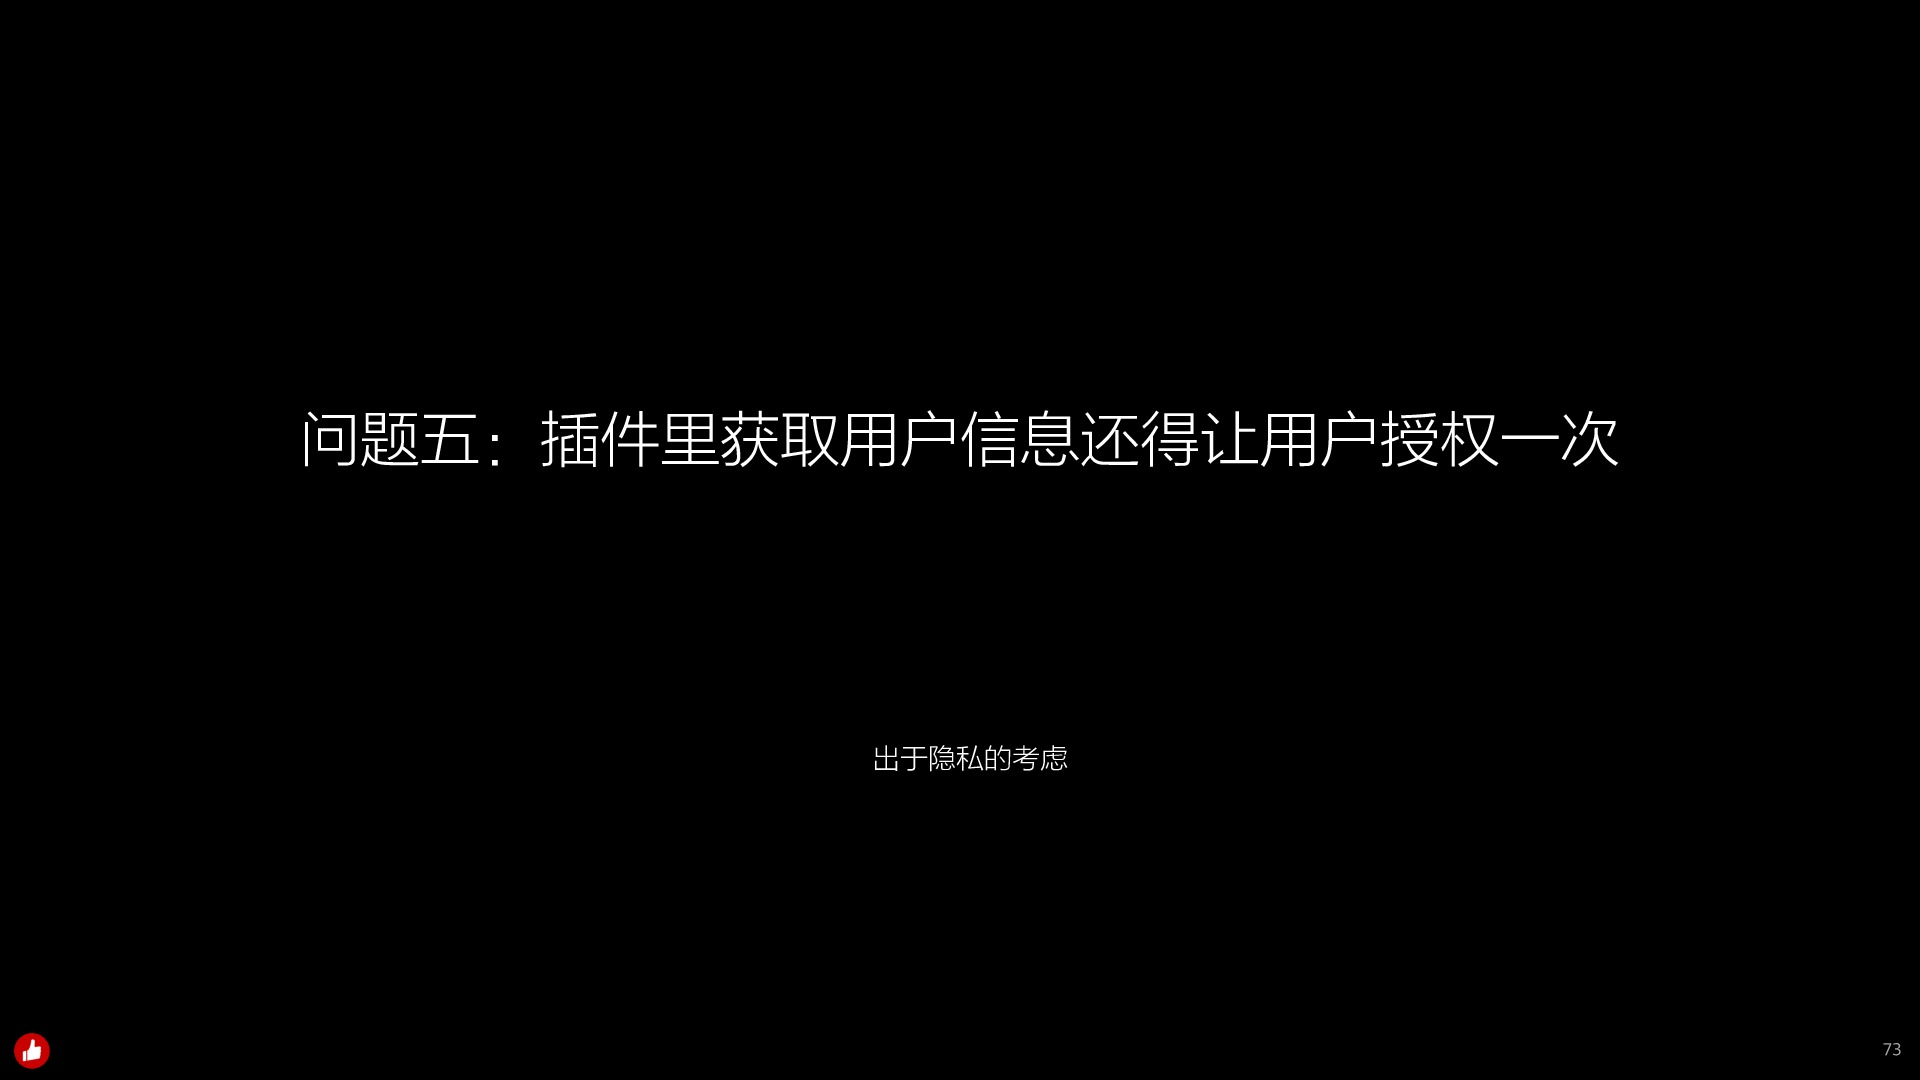 https://opentalk-blog.b0.upaiyun.com/prod/2018-11-26/af63f5a9d96c0d545af877643755dedb